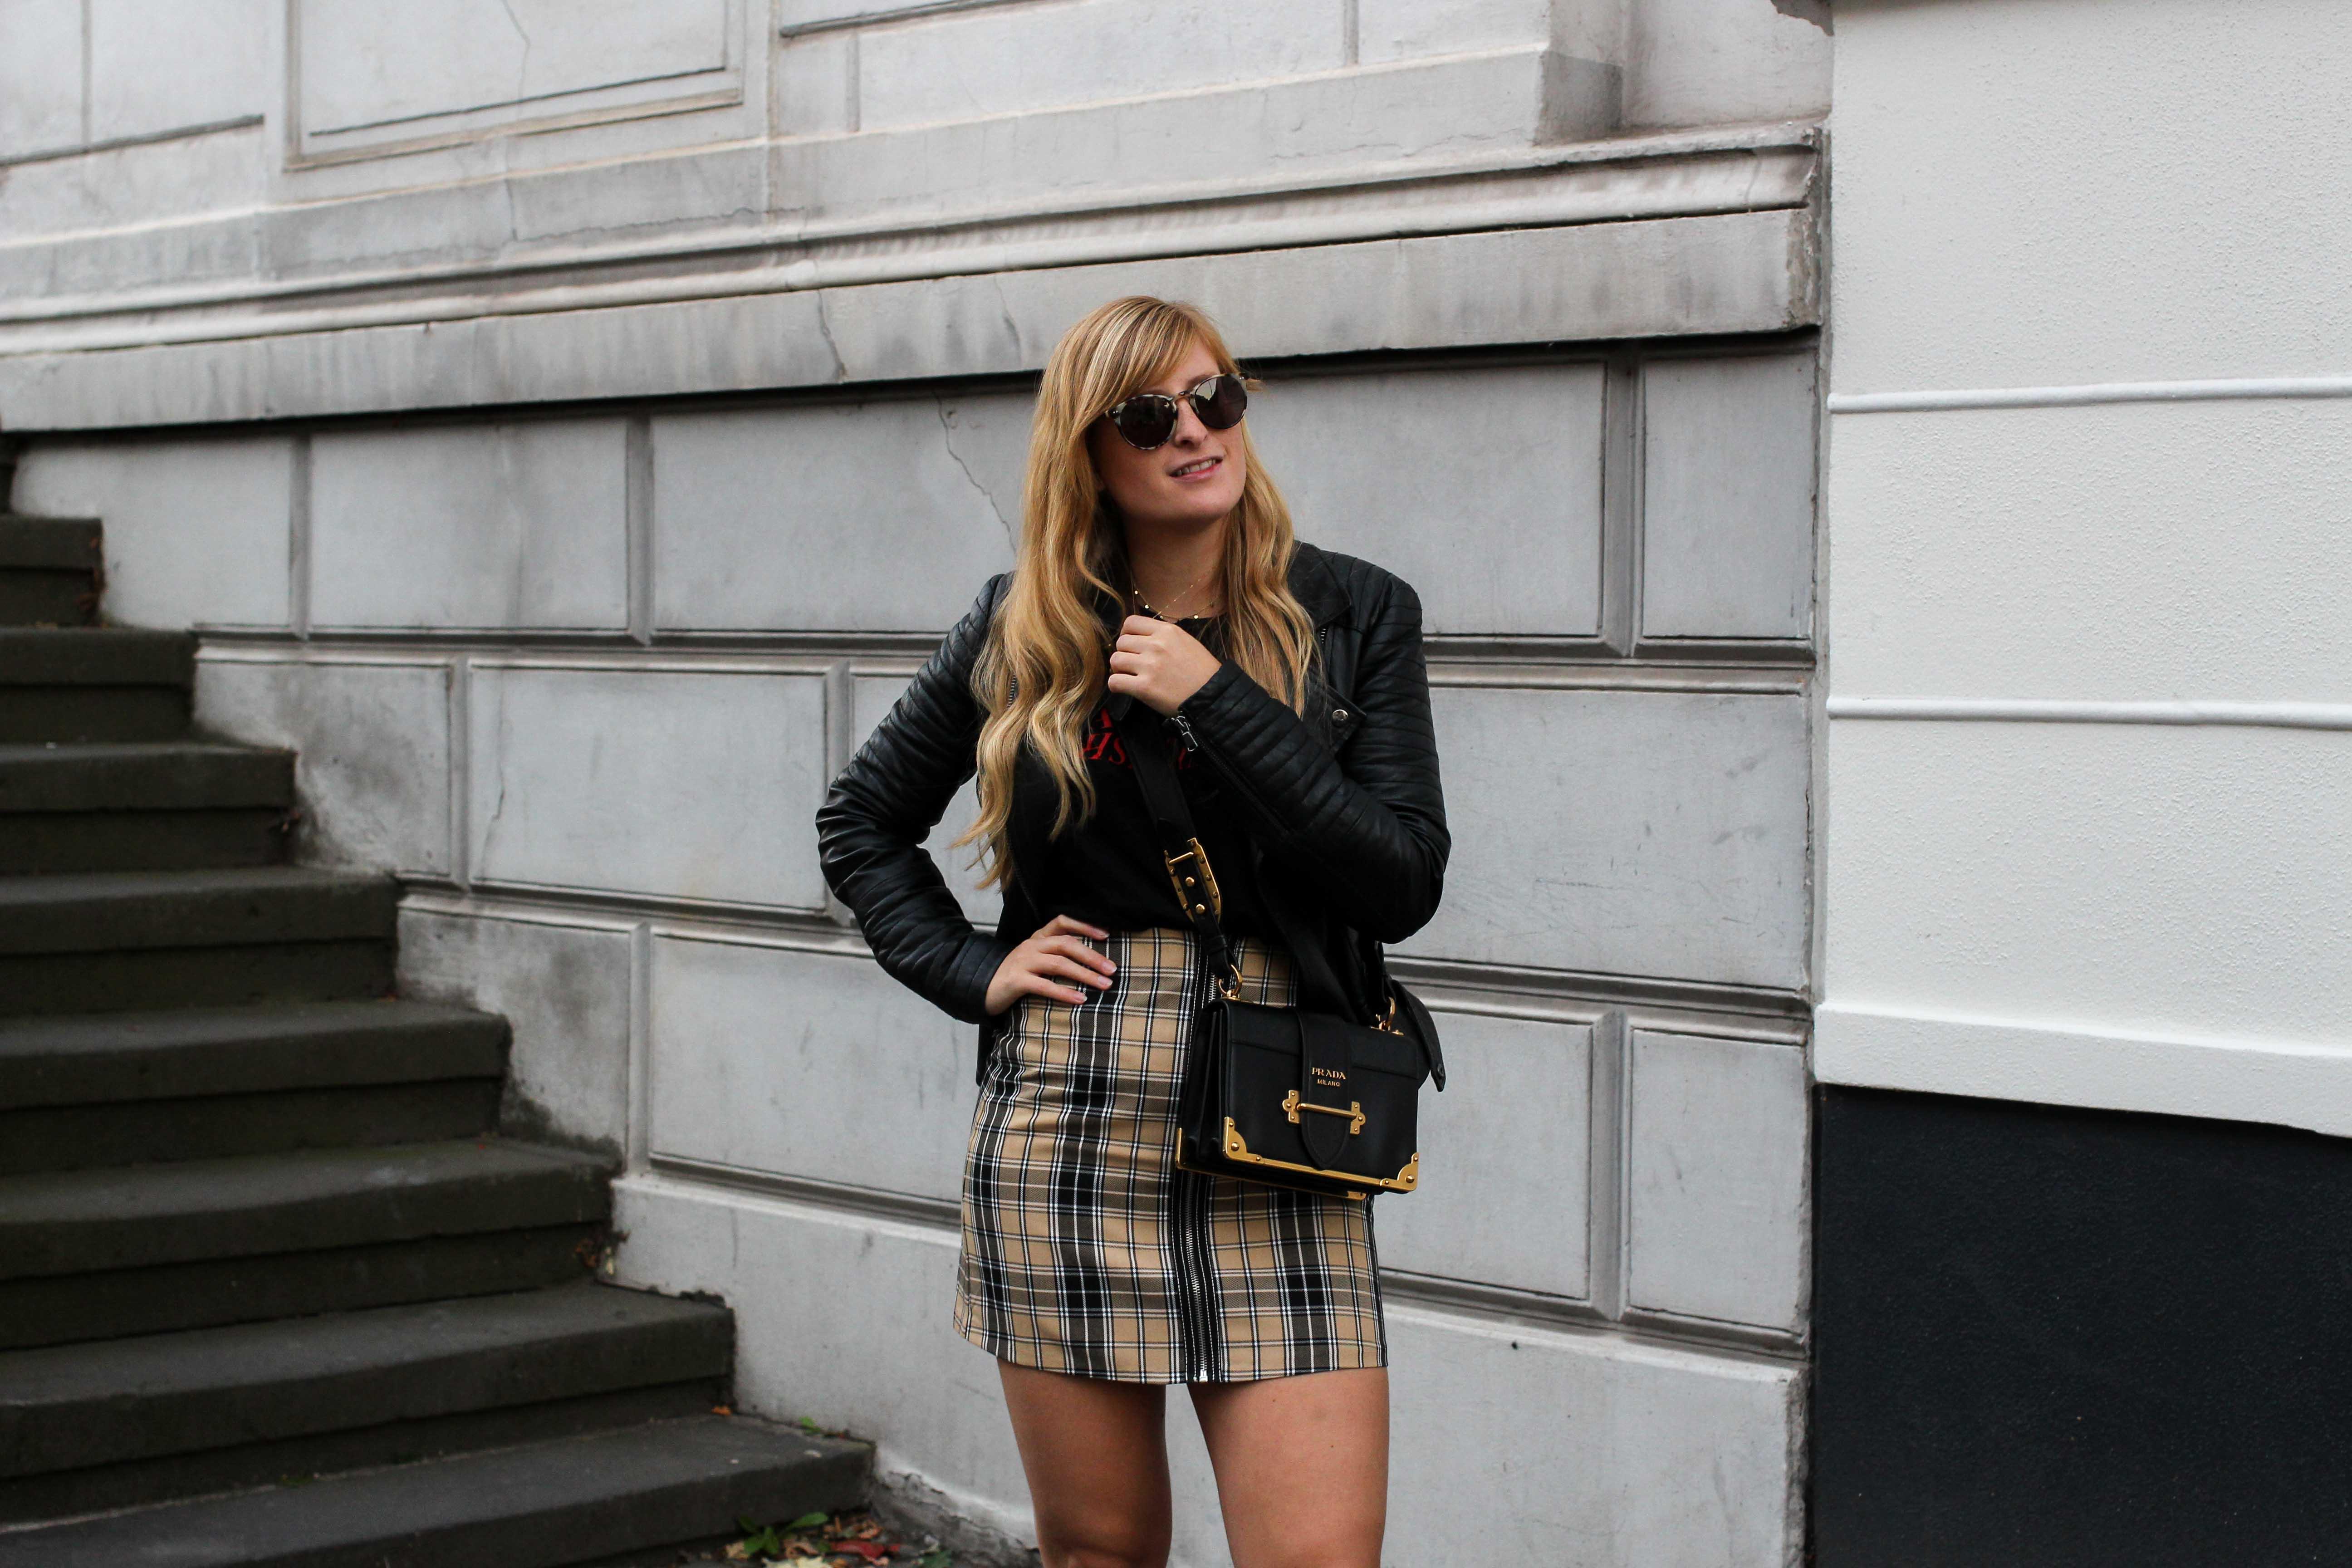 Outfit Karorock kombinieren Lederjacke Schleifenboots Übergangslook Modeblog Prada Cahier Tasche schwarz Bonn 7